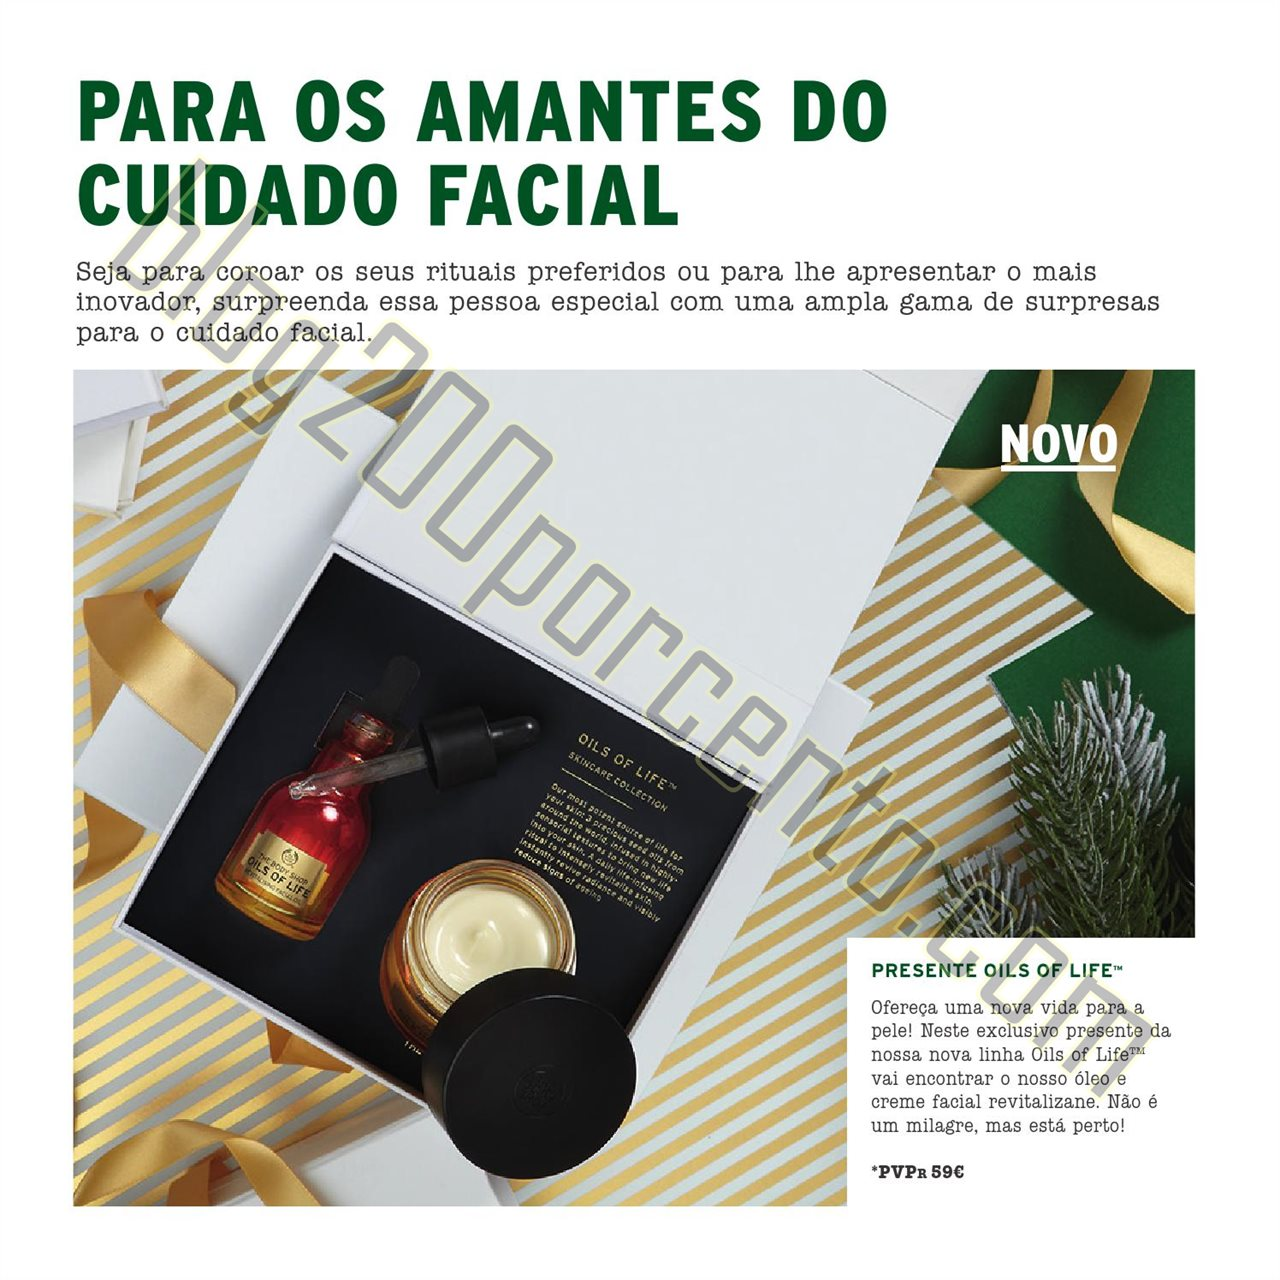 Novo Folheto THE BODY SHOP Natal 2015 p12.jpg